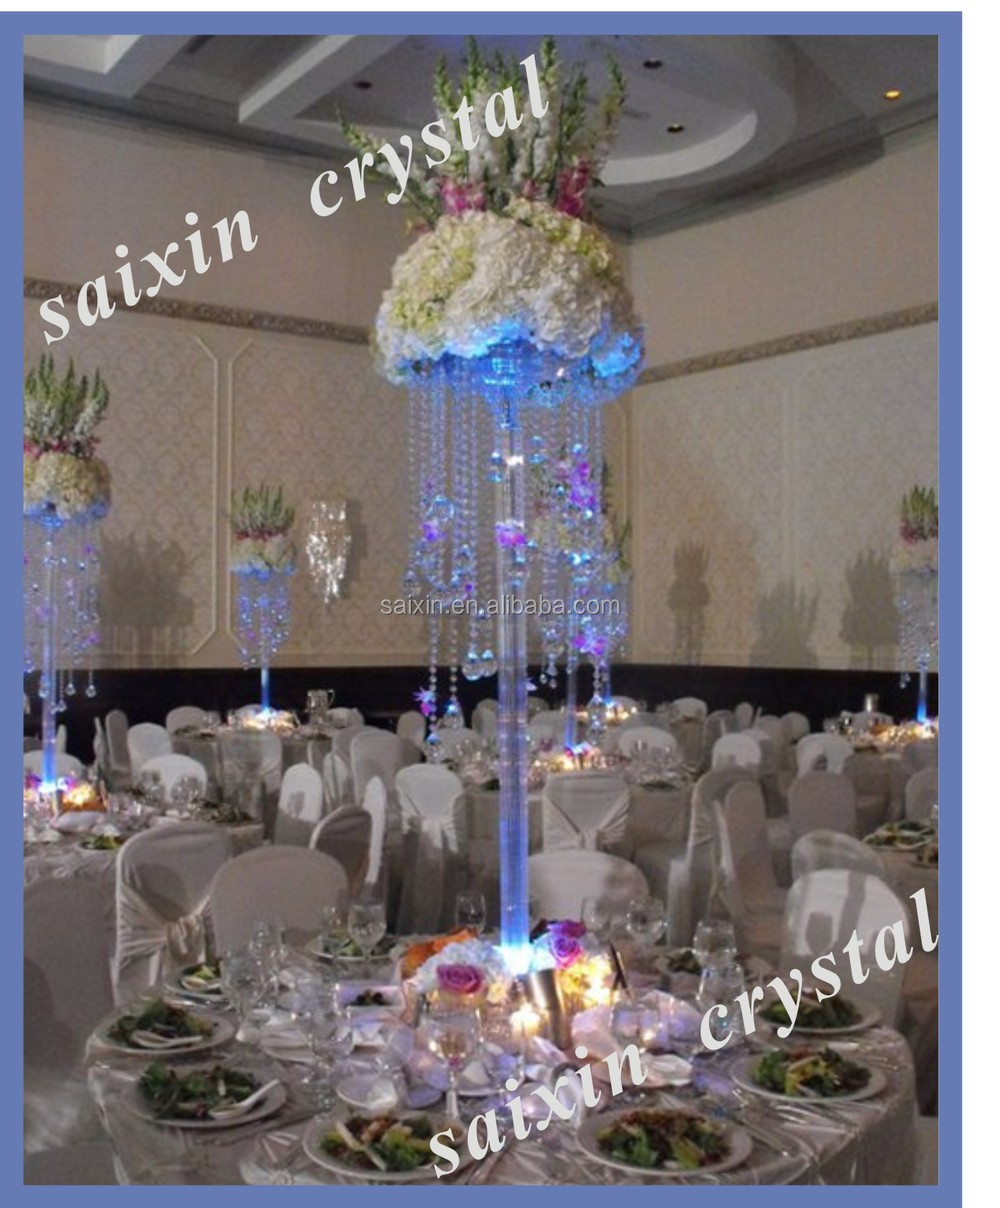 Crystal candelabra tall wedding candelabra centerpiece buy tall zt 155g 8g junglespirit Choice Image